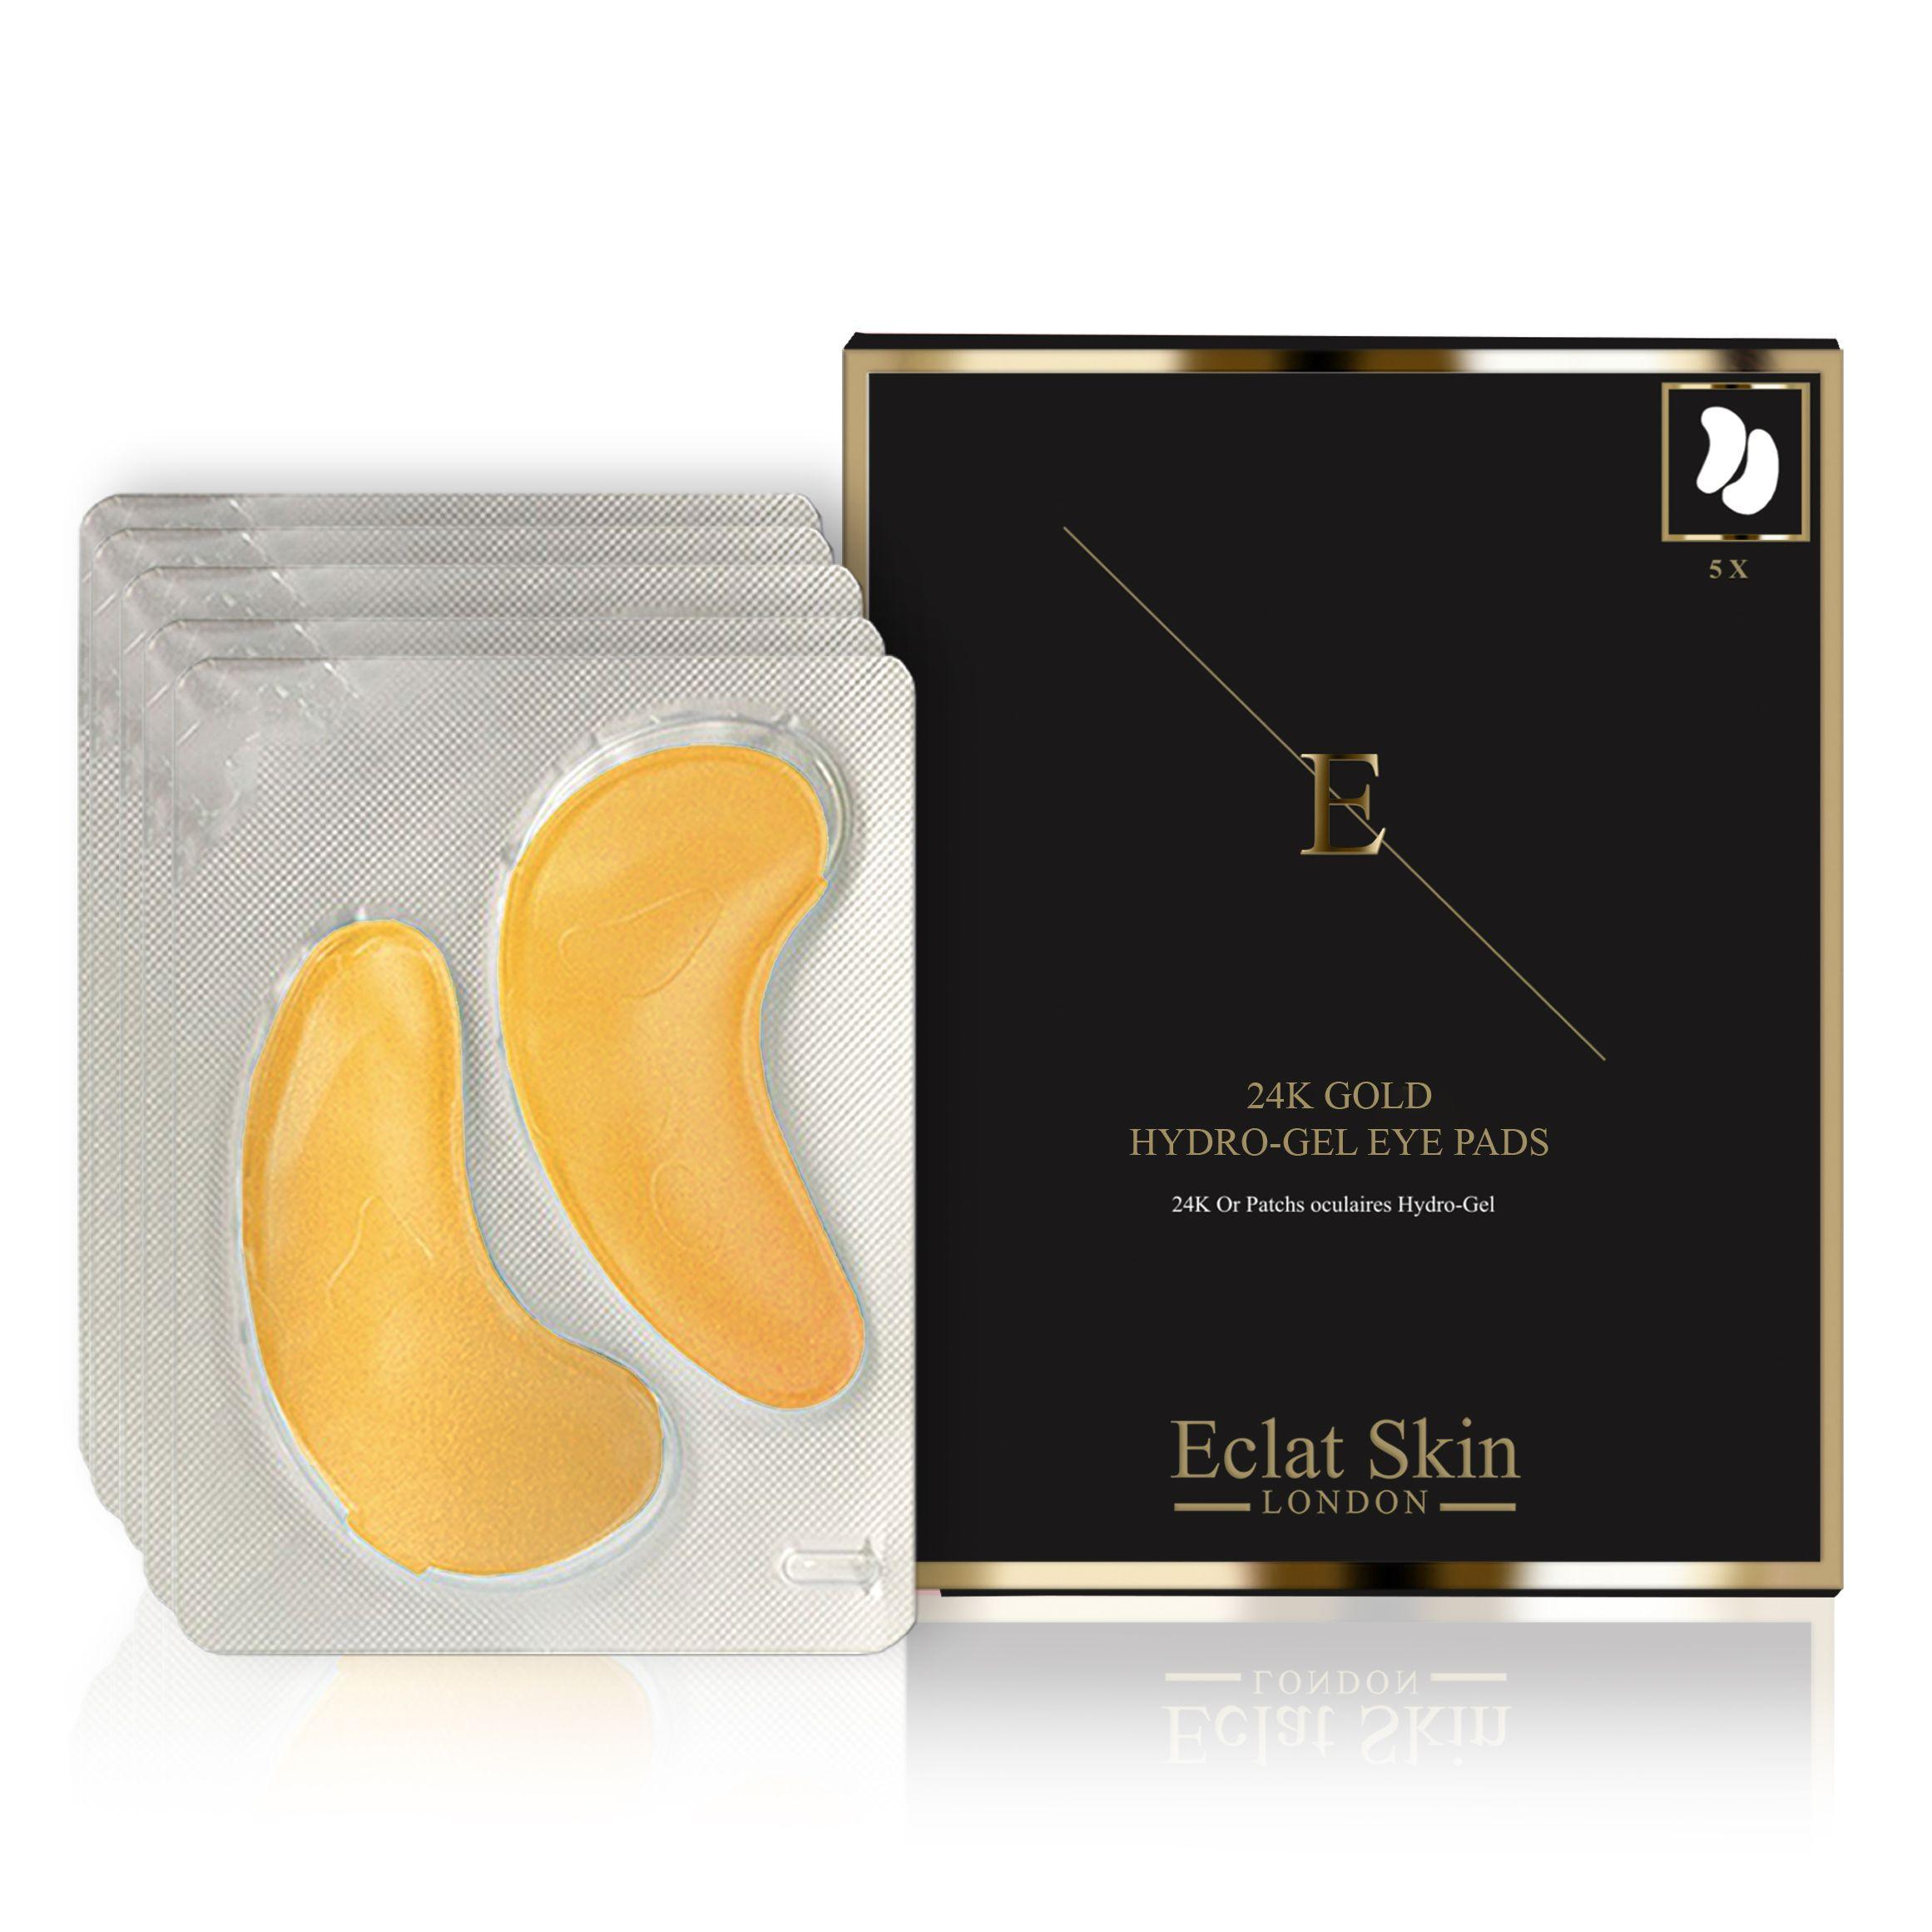 Collagen Gold Under Eye Patch 24K Gold - 5x2 Pads